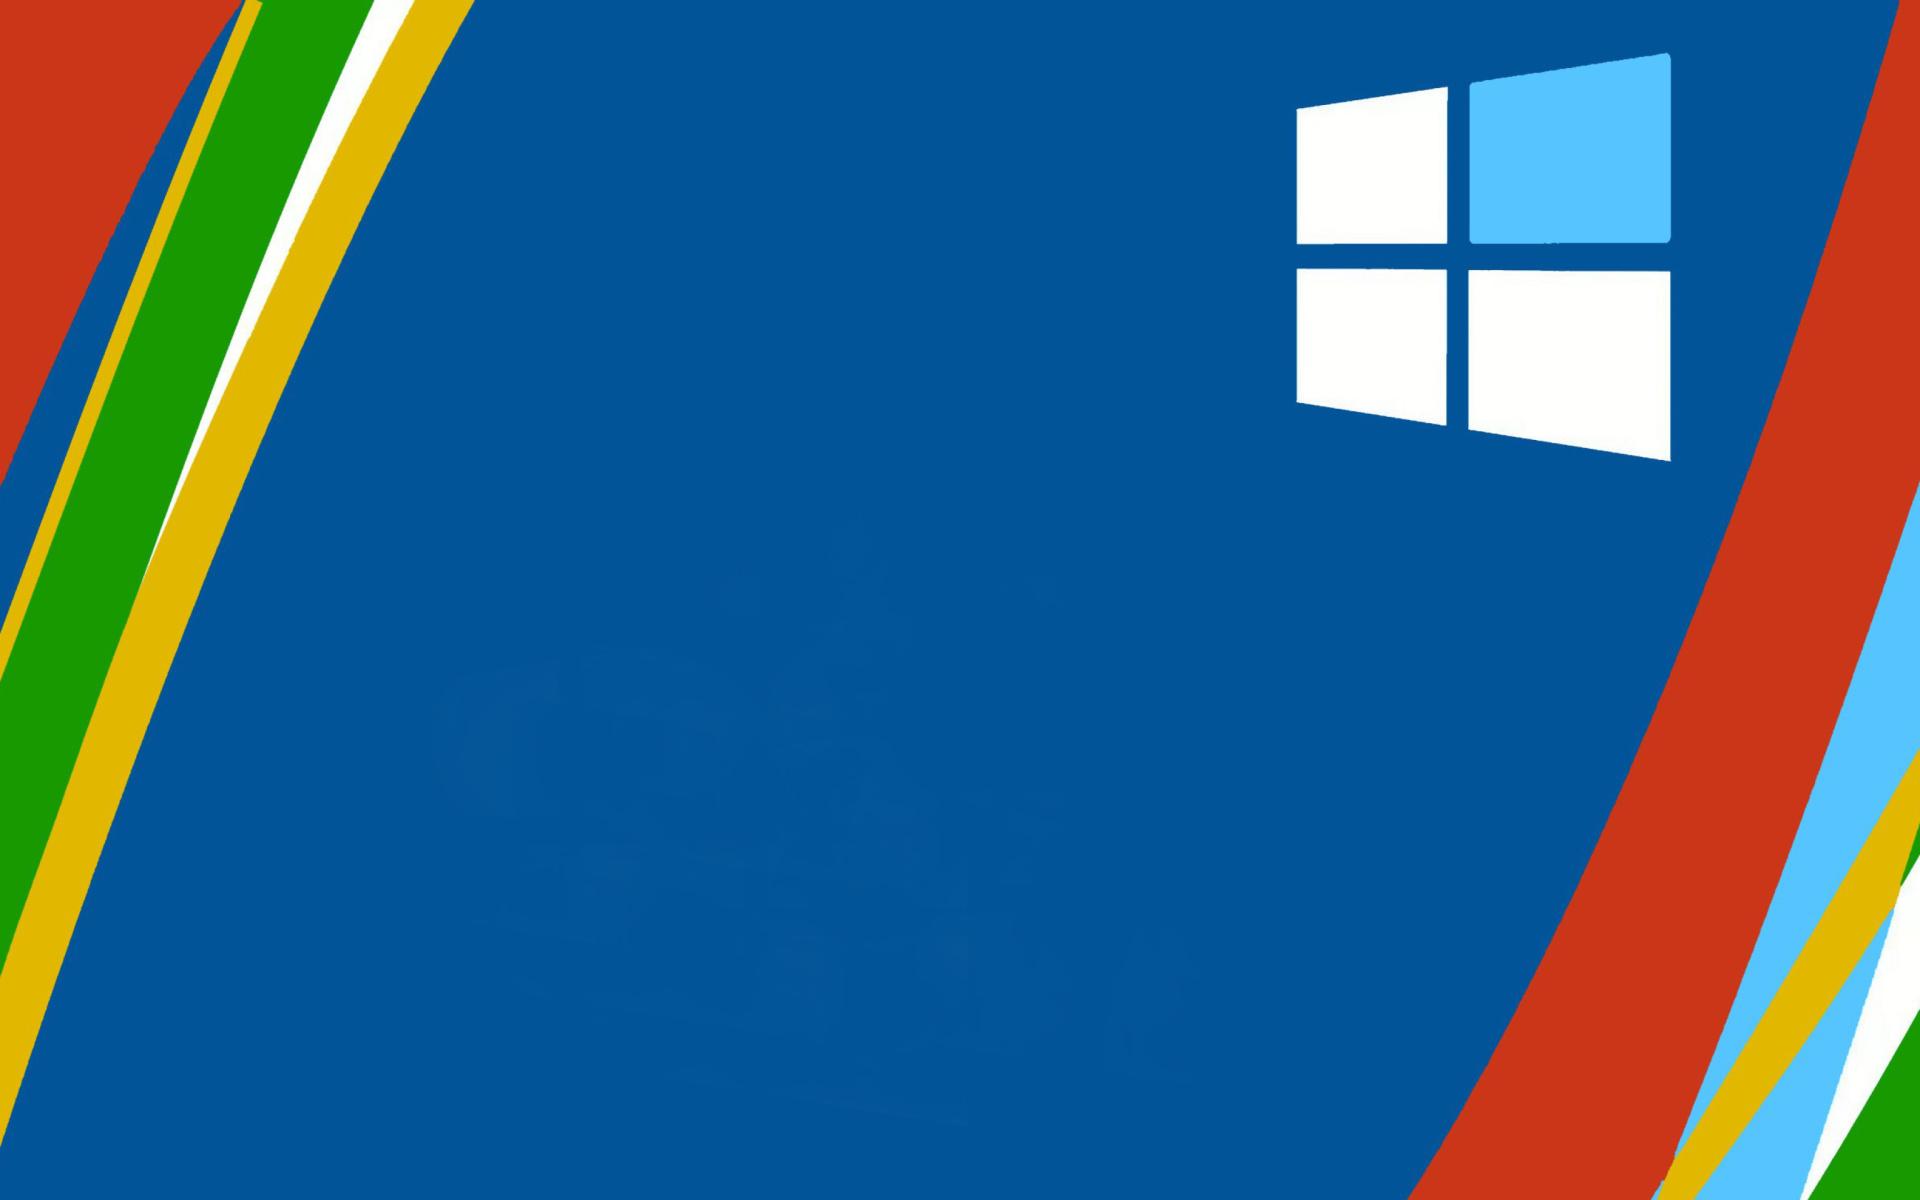 Windows 10 hd wallpaper widescreen wallpapersafari - Hd wallpapers for pc windows ...